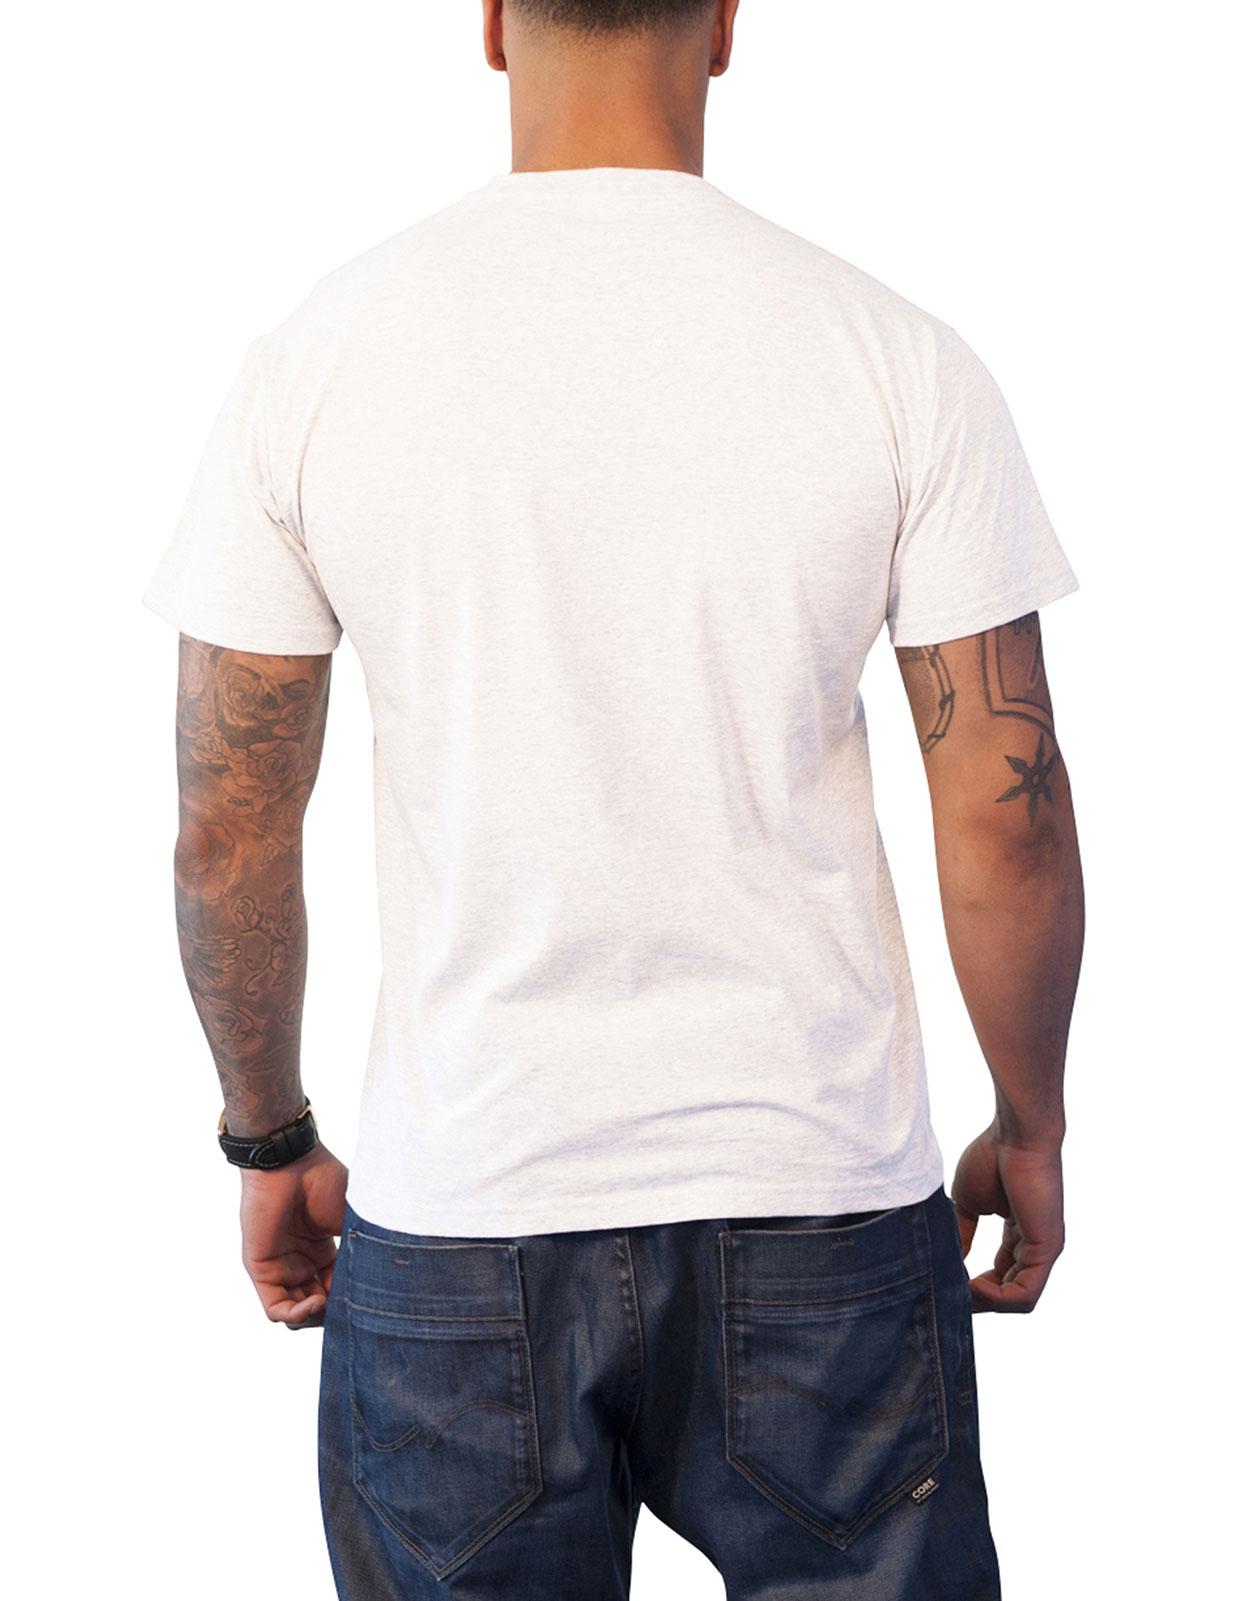 Camiseta-Last-Jedi-De-Star-Wars-Movie-Poster-porgs-Guardia-pretoriana-oficial-para-hombre miniatura 19